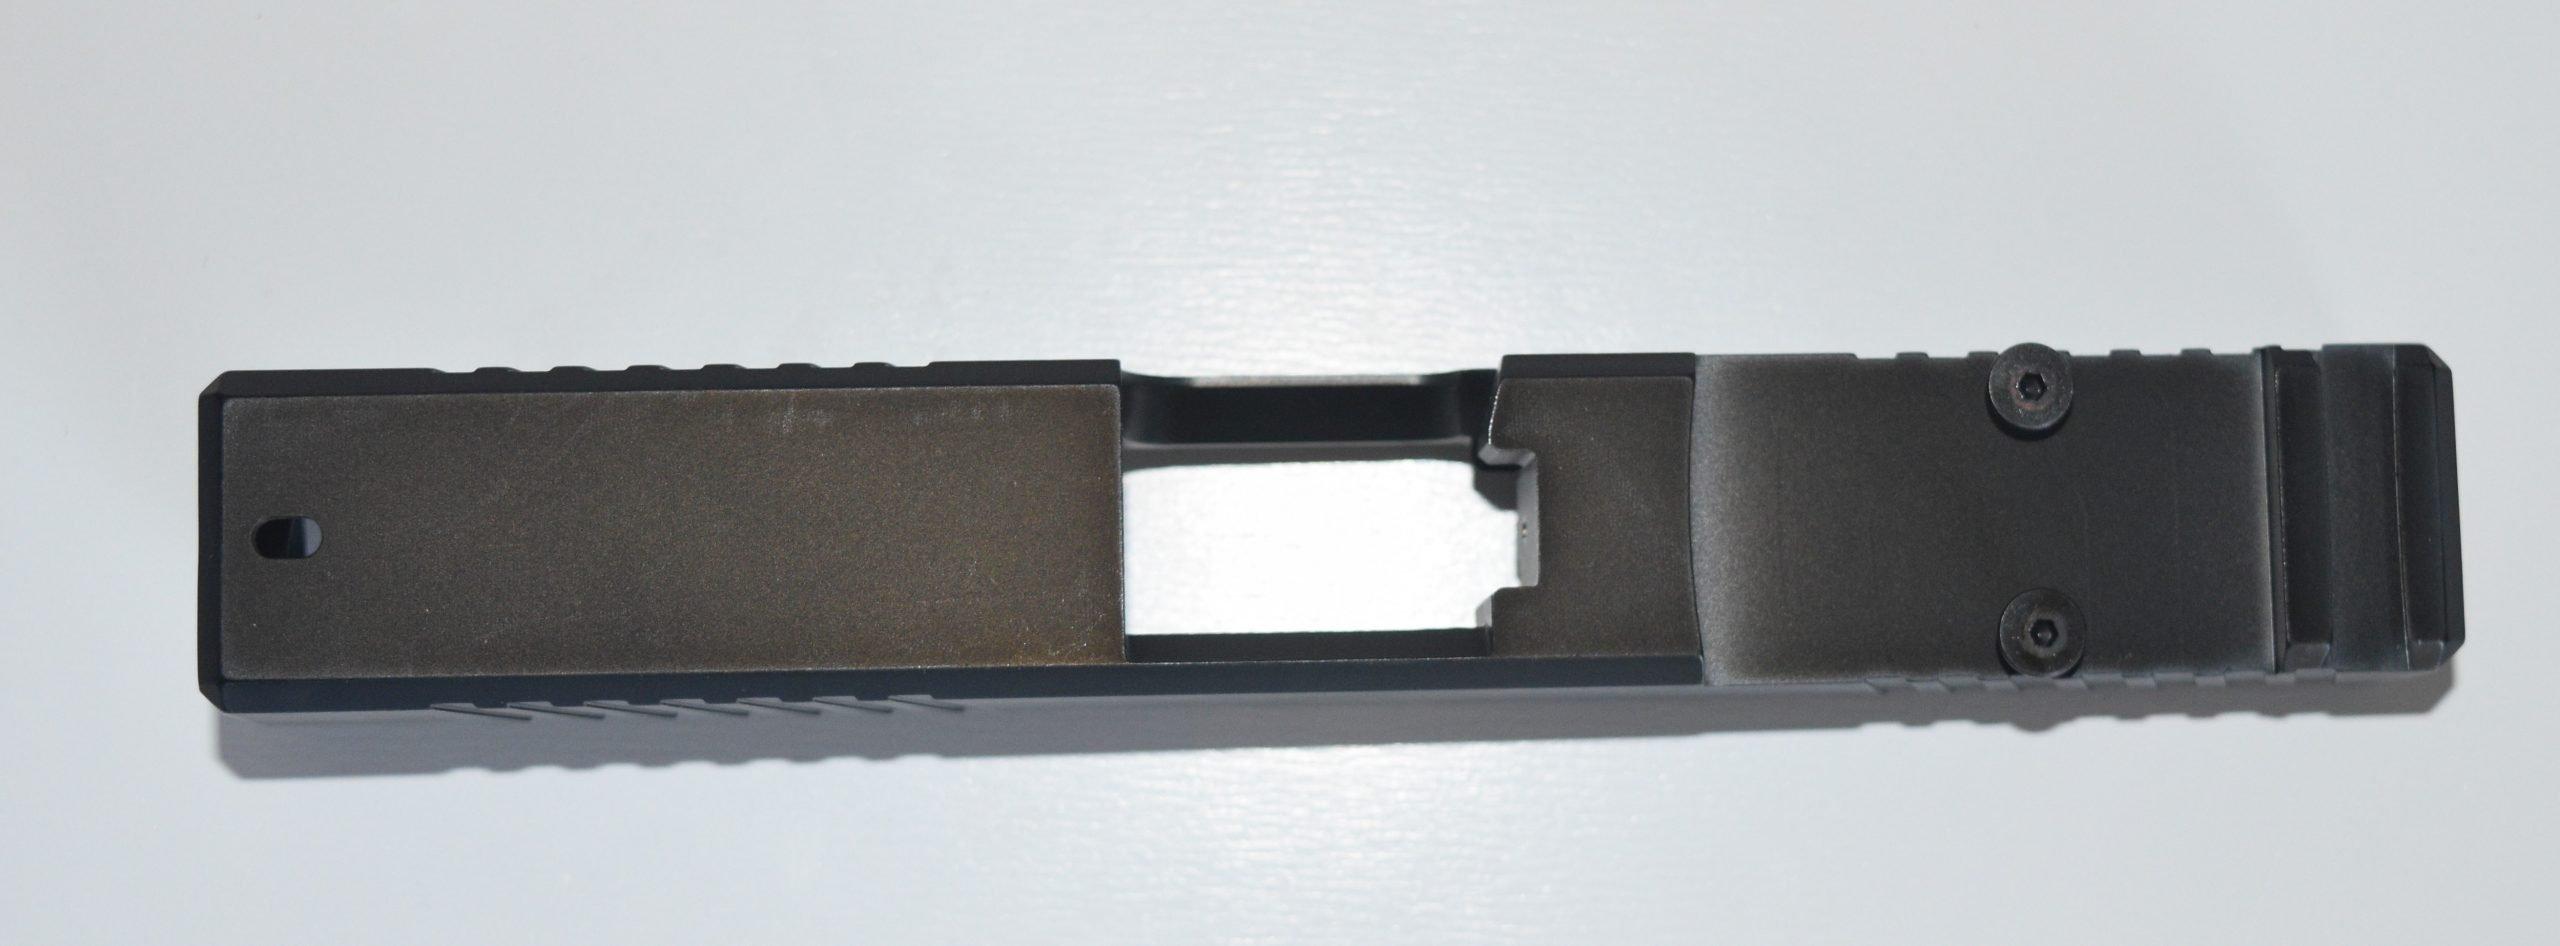 Glock 19 DLC RMR